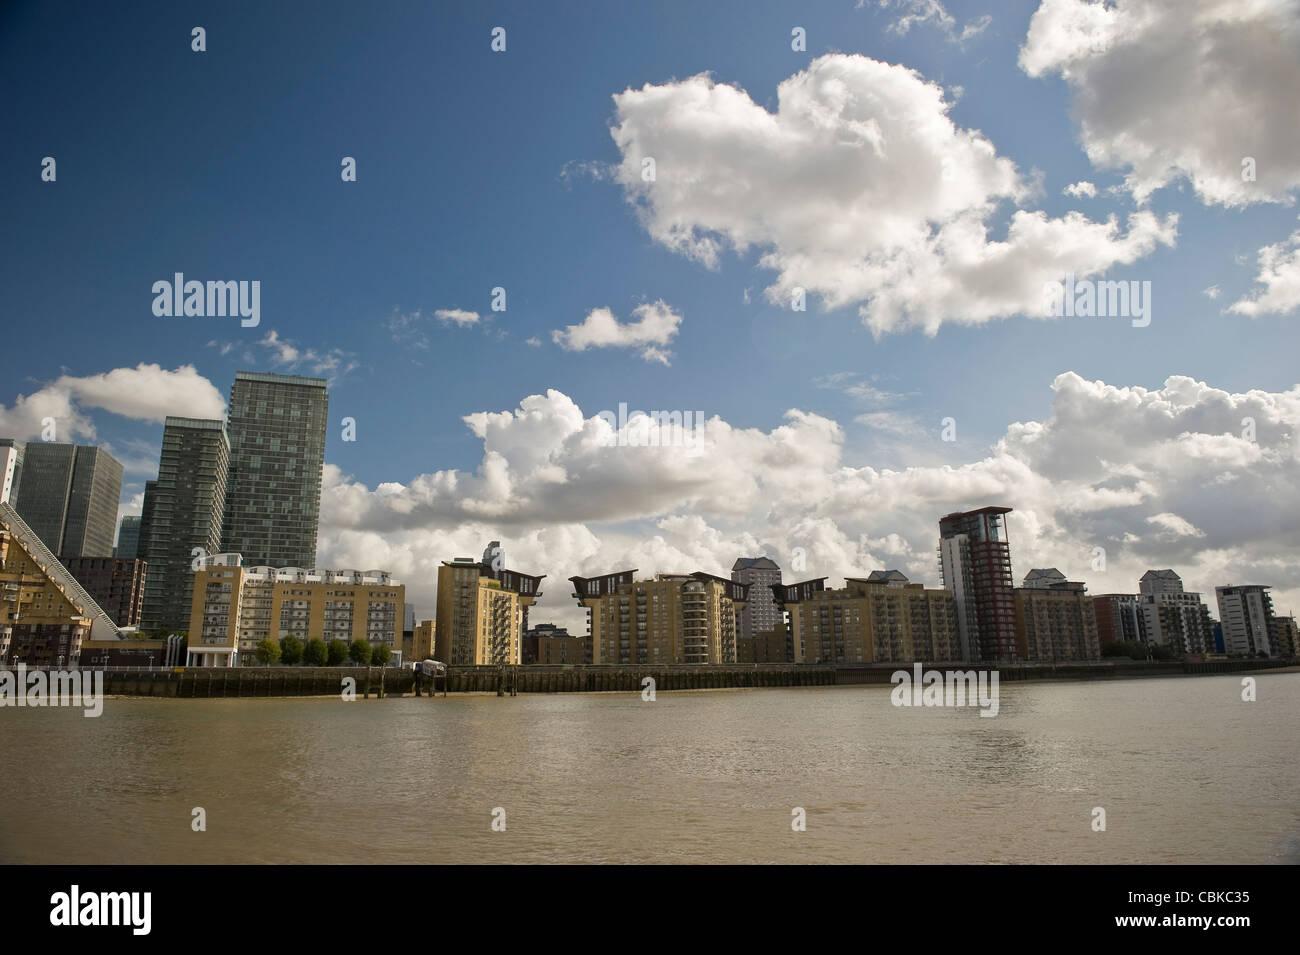 Riverside residential tower blocks in Docklands, London, UK - Stock Image